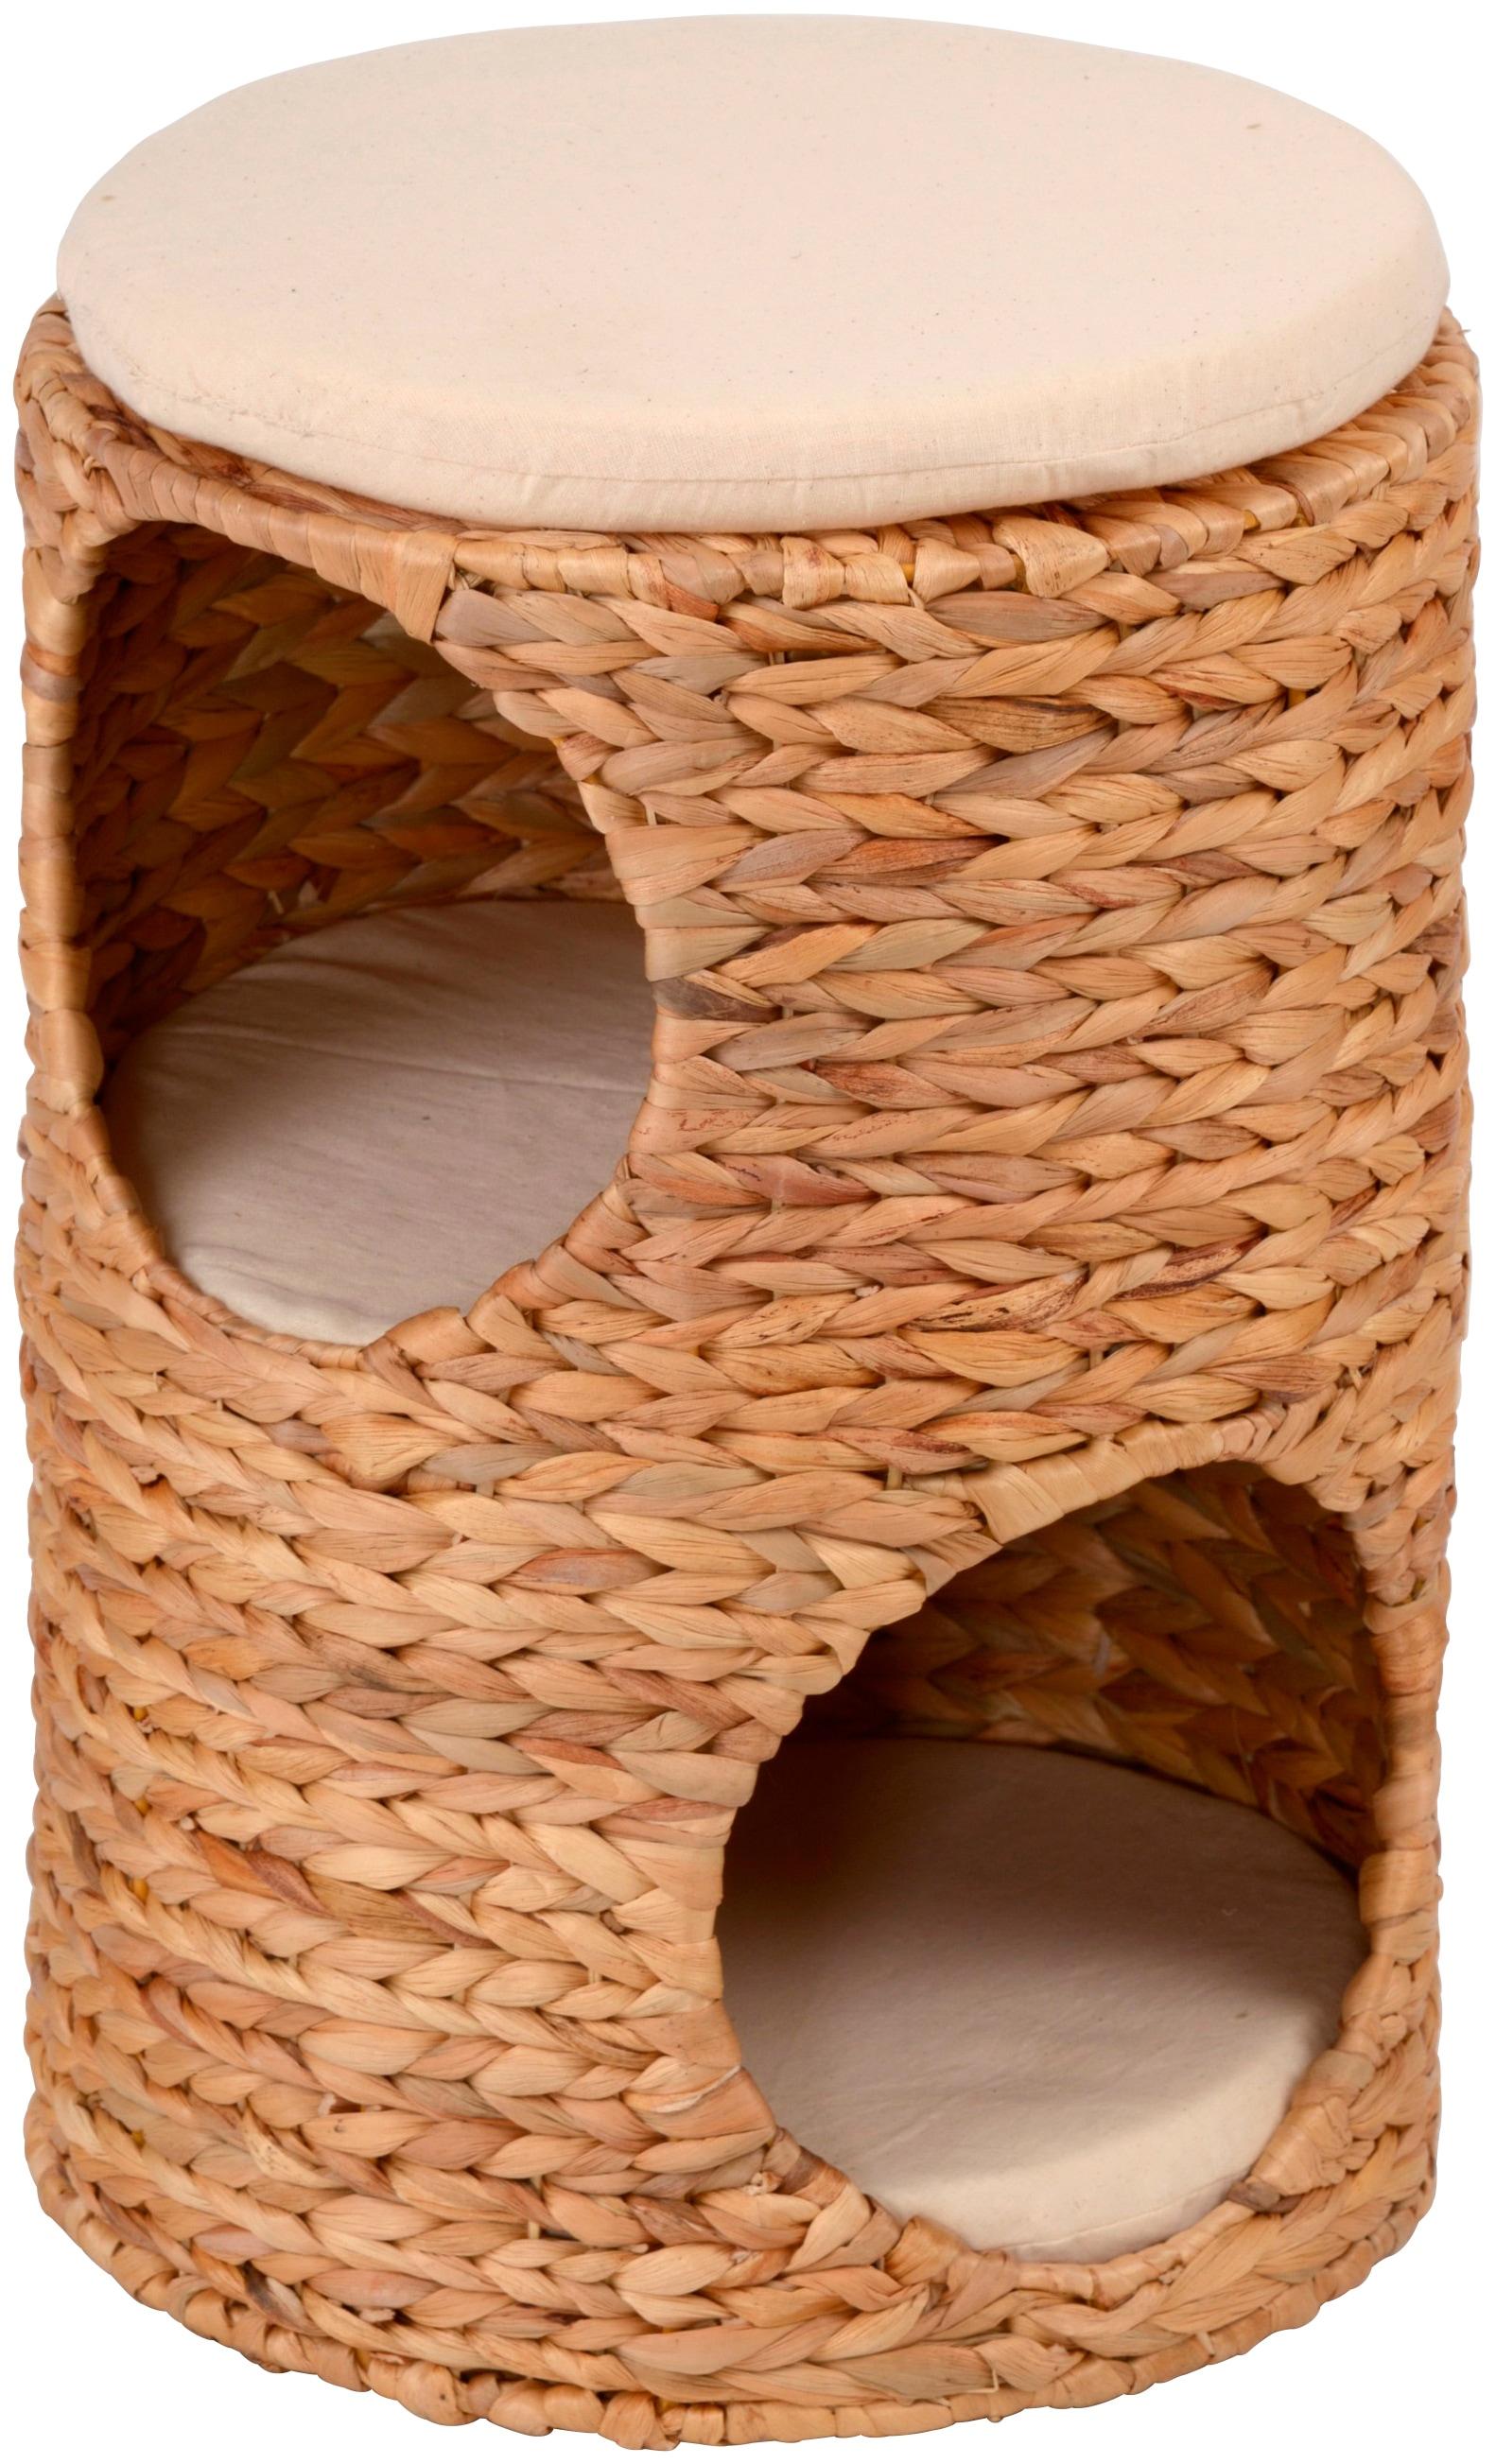 SILVIO design Tierbett Korbturm Wasserhyazinthe, BxLxH: 32x32x47 cm, natur beige Katzenkörbe -kissen Katze Tierbedarf